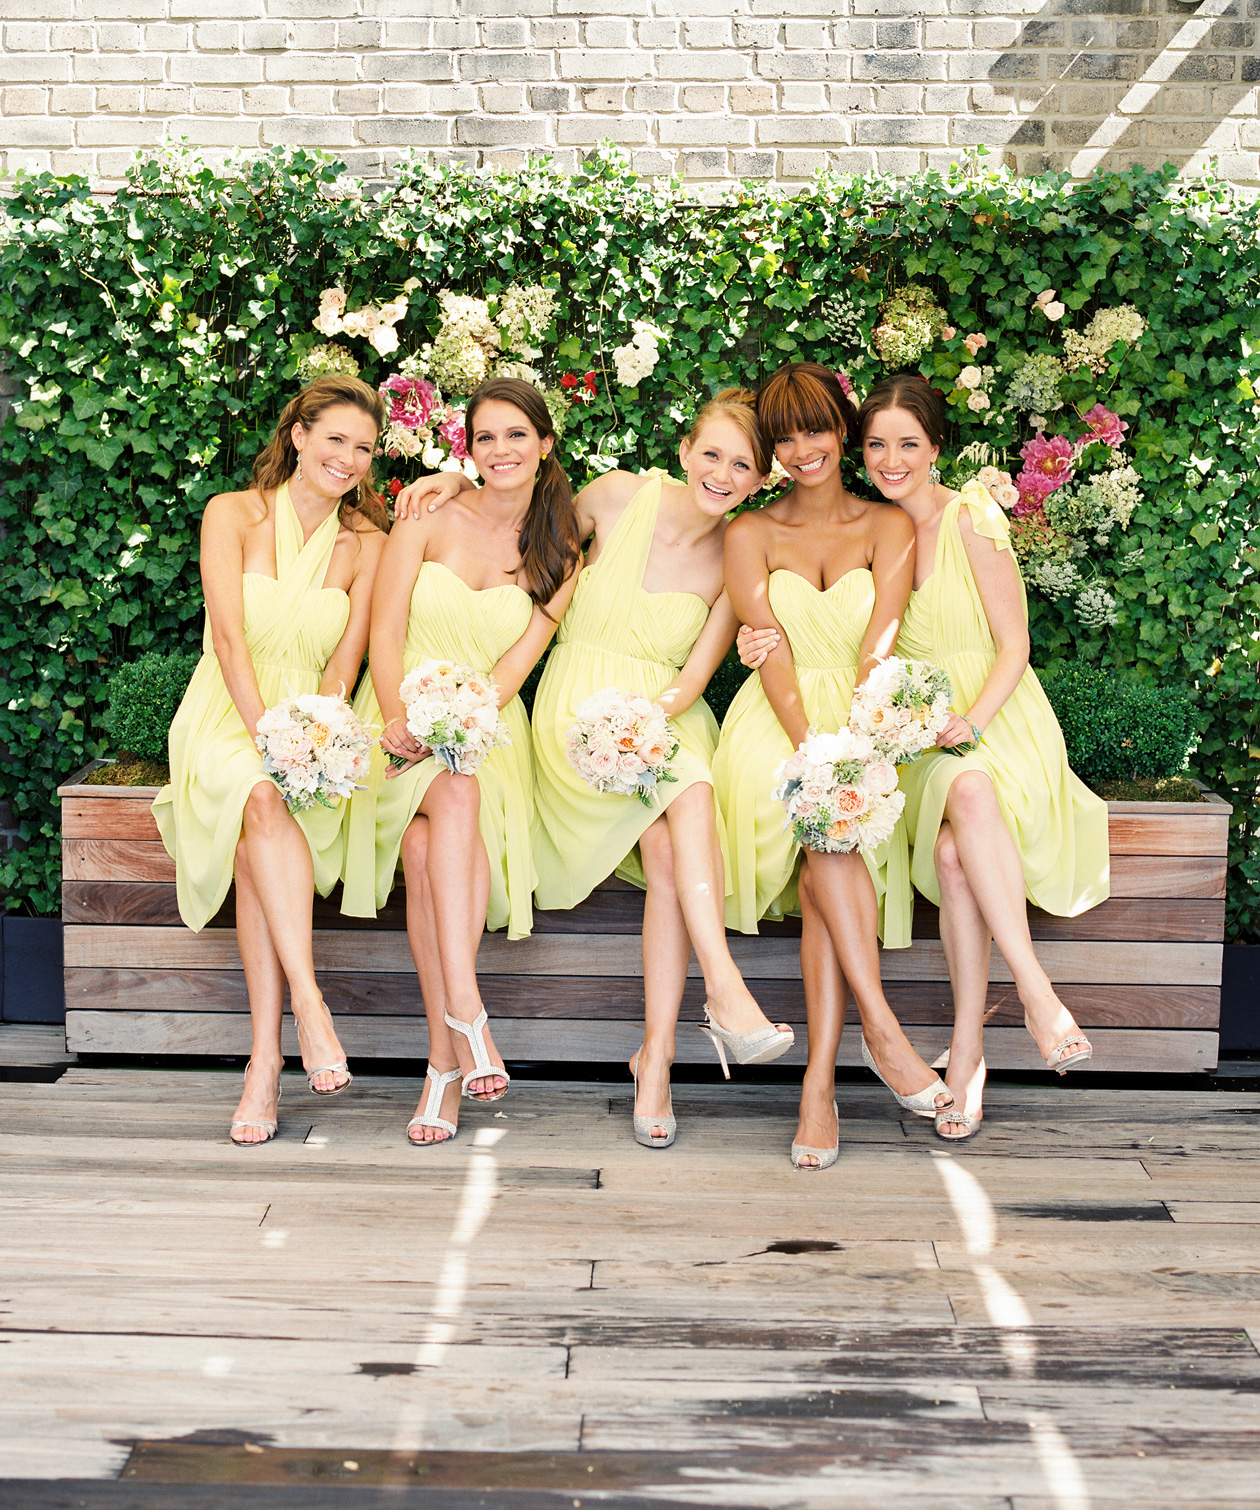 Magic dress bridesmaid uk 2013 bridesmaid dress trends convertible dress ombrellifo Image collections